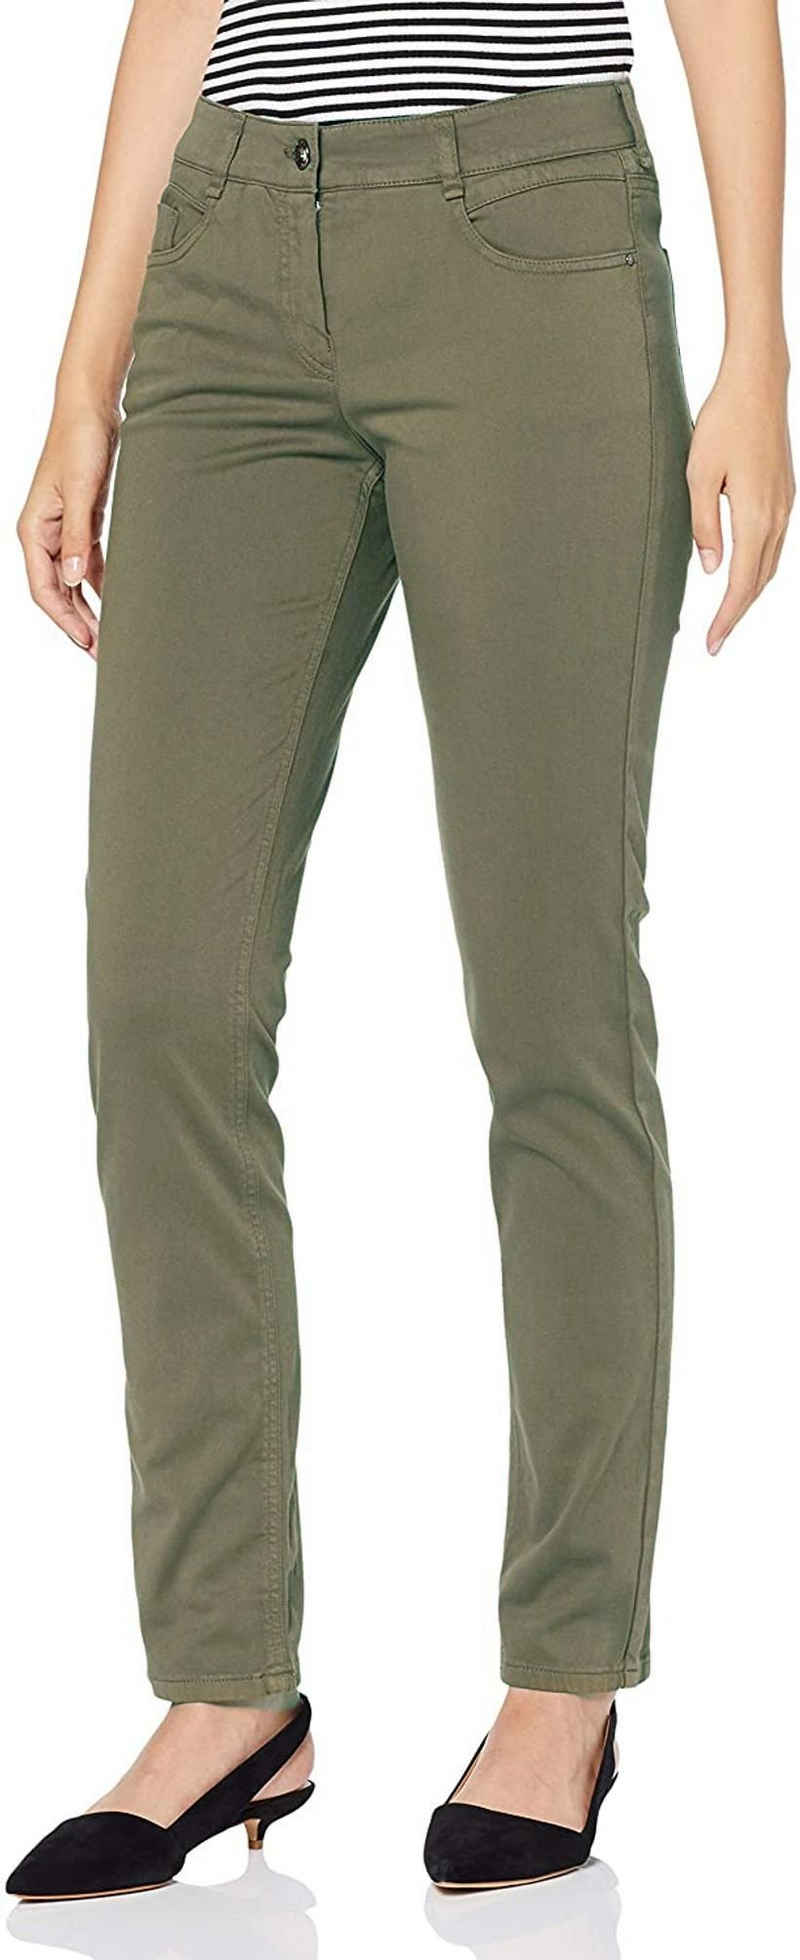 Atelier GARDEUR 5-Pocket-Jeans »601021«